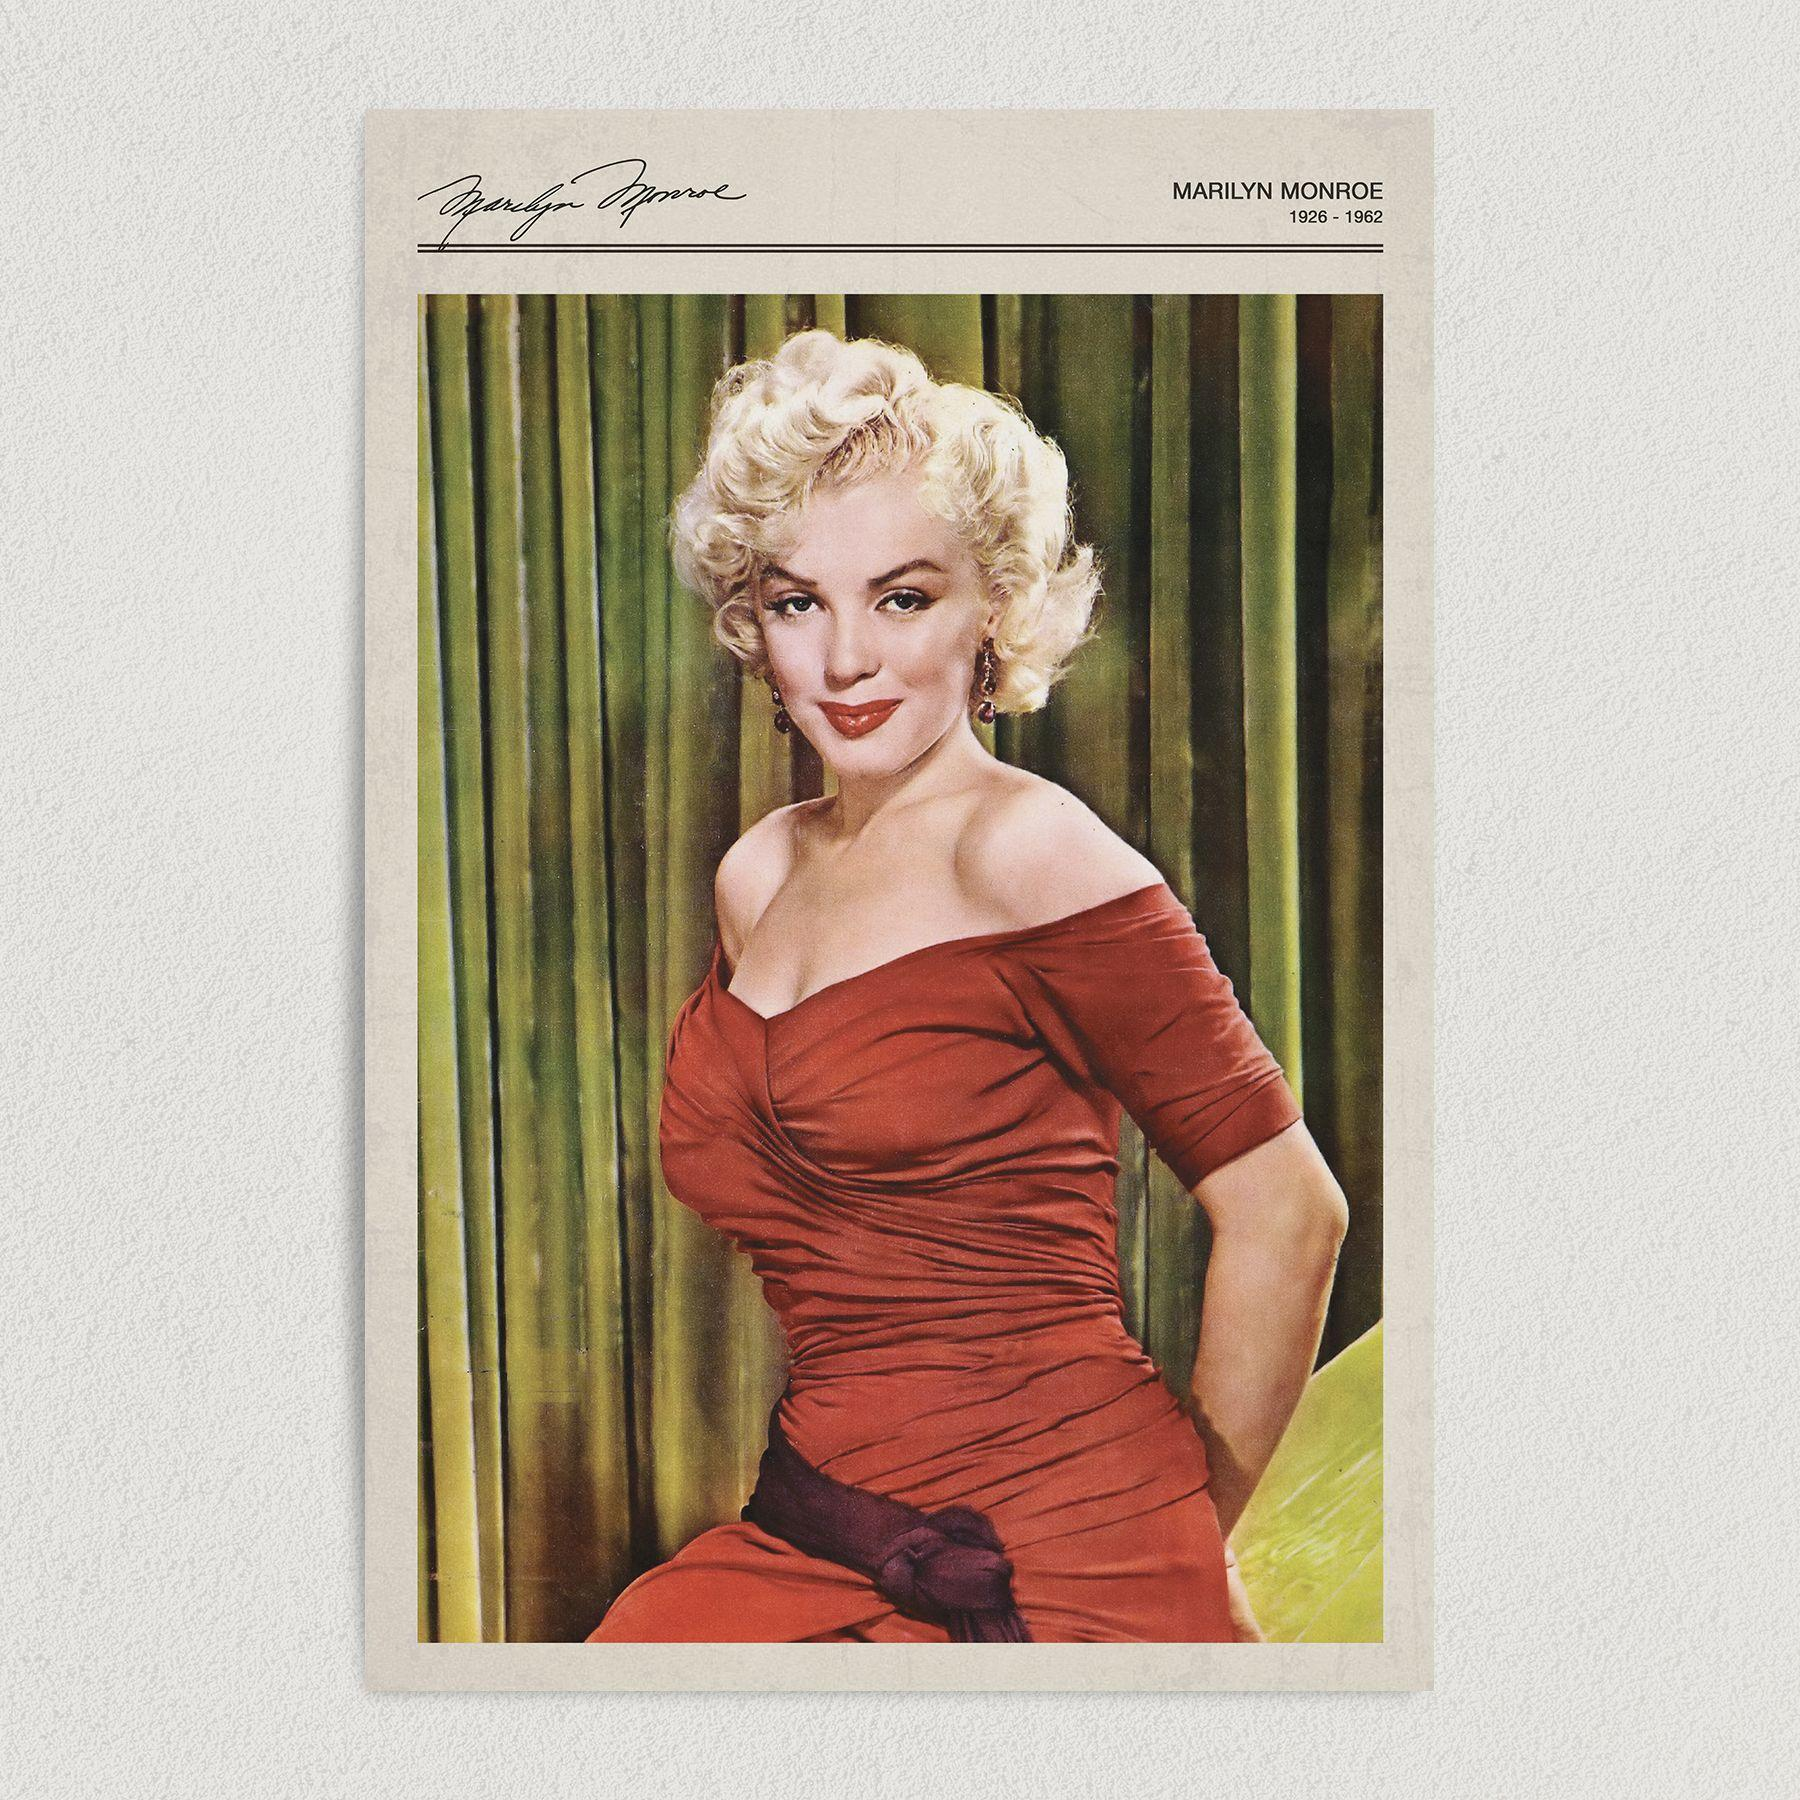 Marilyn Monroe Vintage Portrait Art Print Poster 12″ x 18″ Wall Art WH1000